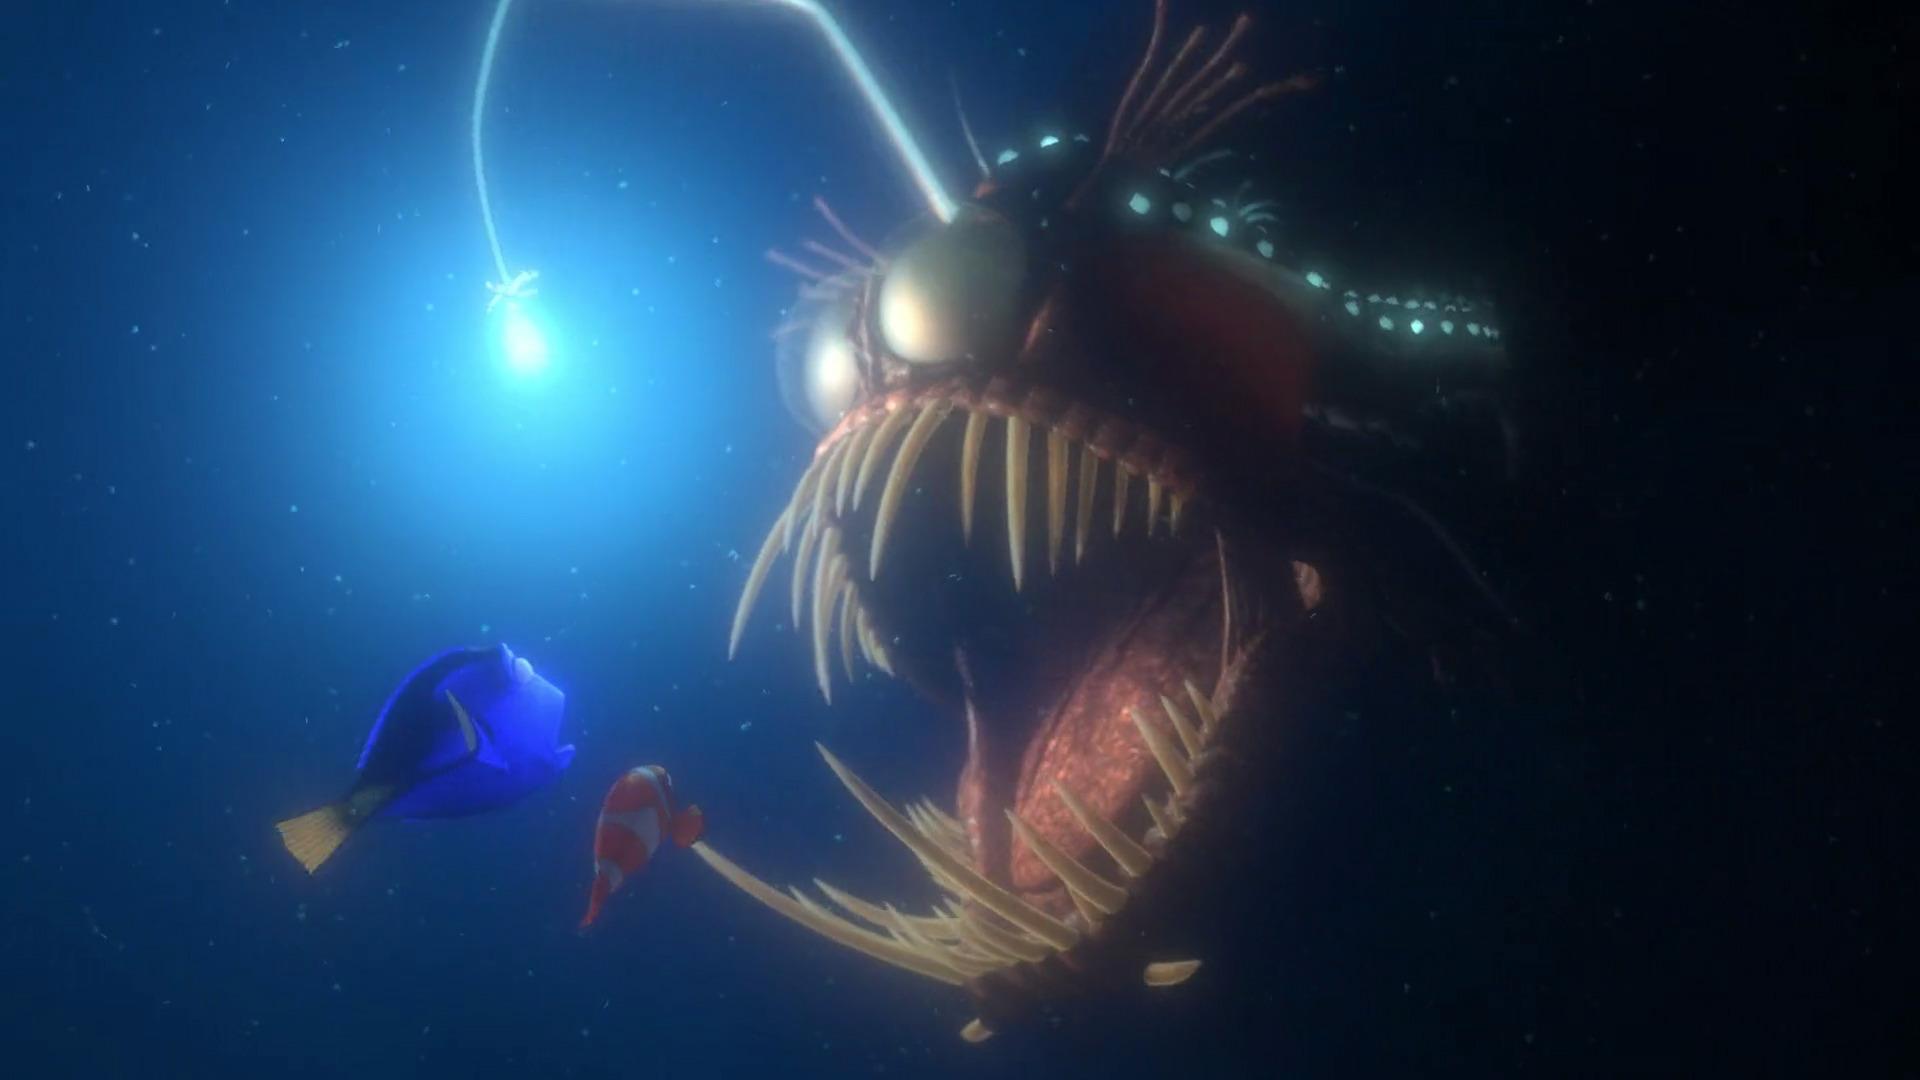 Pixar rewind 39 finding nemo 39 rotoscopers for Finding nemo fish